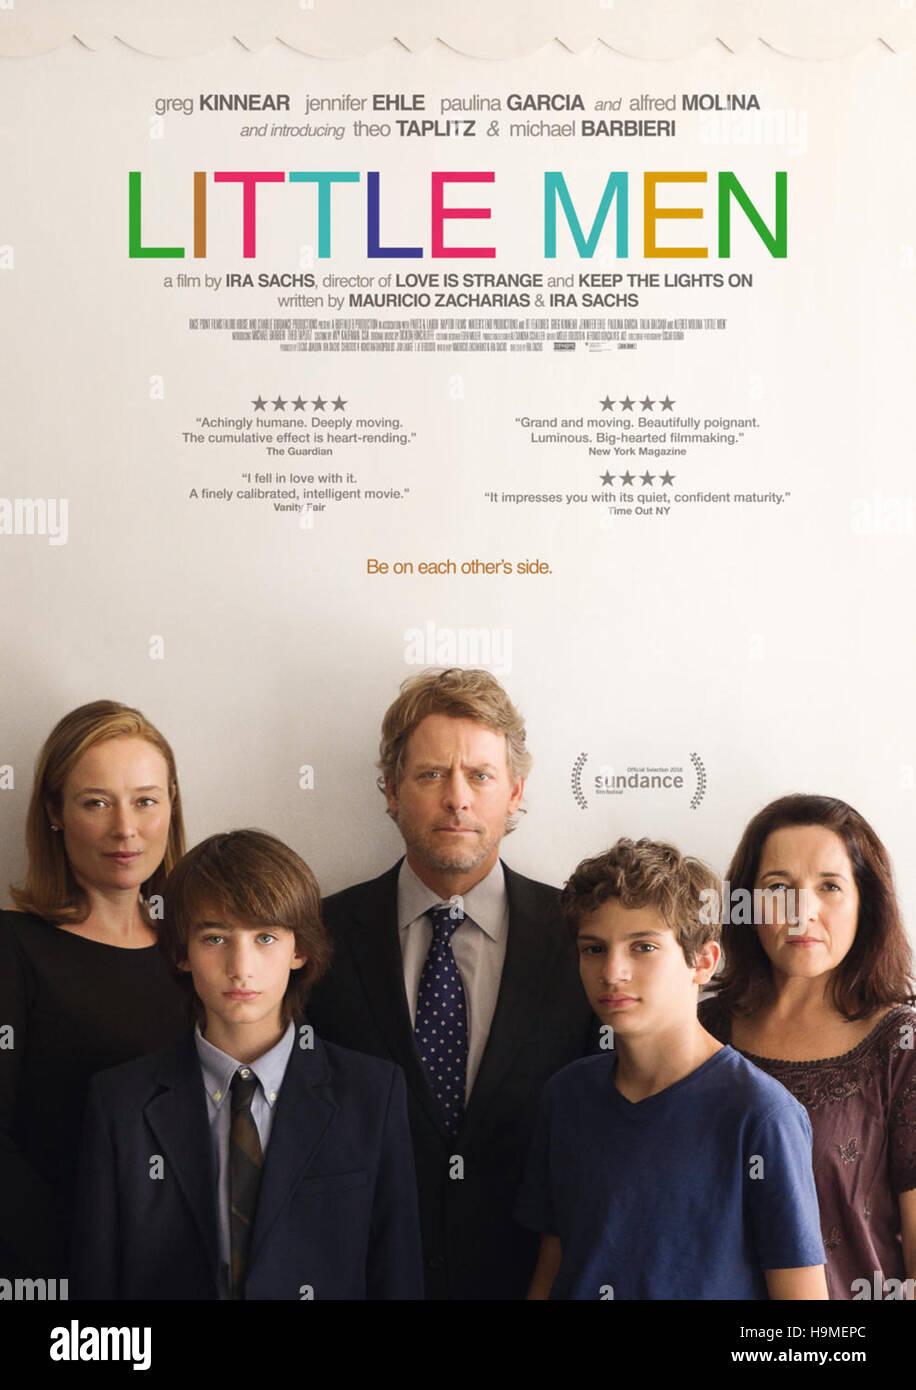 LITTLE MEN (2016) IRA SACHS (DIR) MOVIESTORE COLLECTION LTD - Stock Image